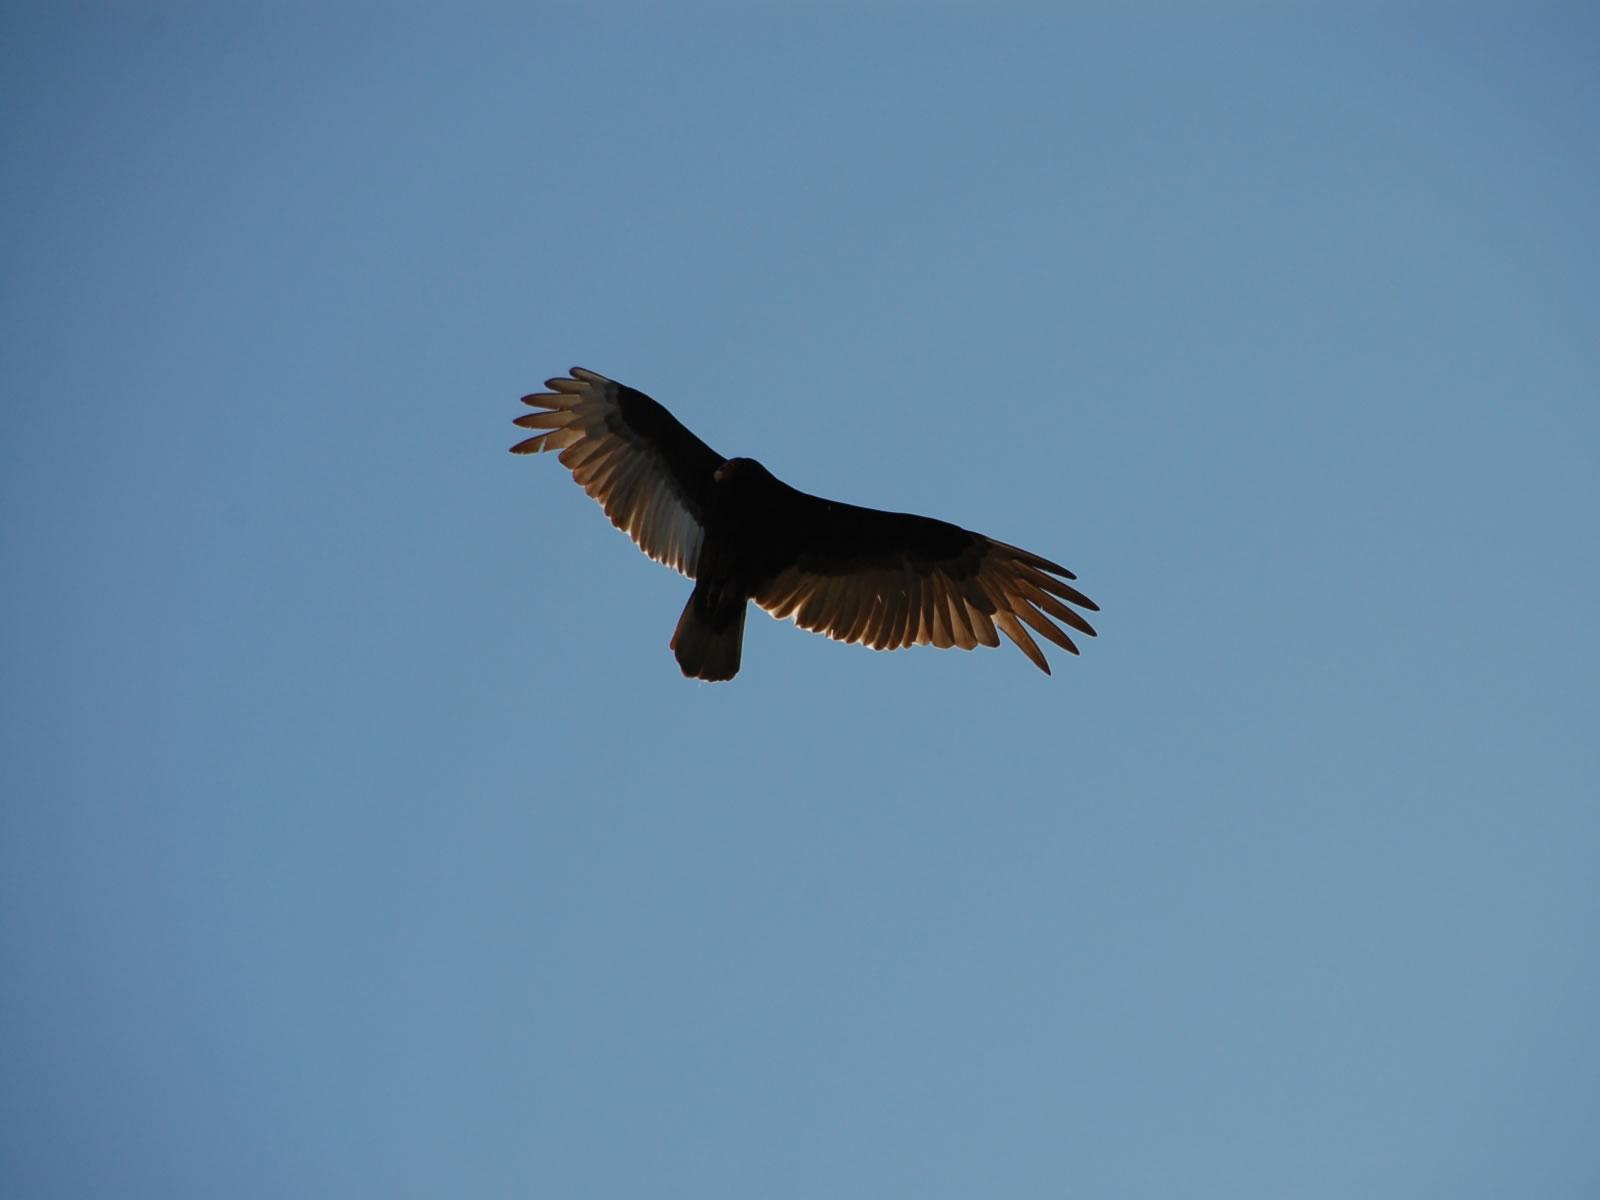 Eagle Flying - Falcon , HD Wallpaper & Backgrounds